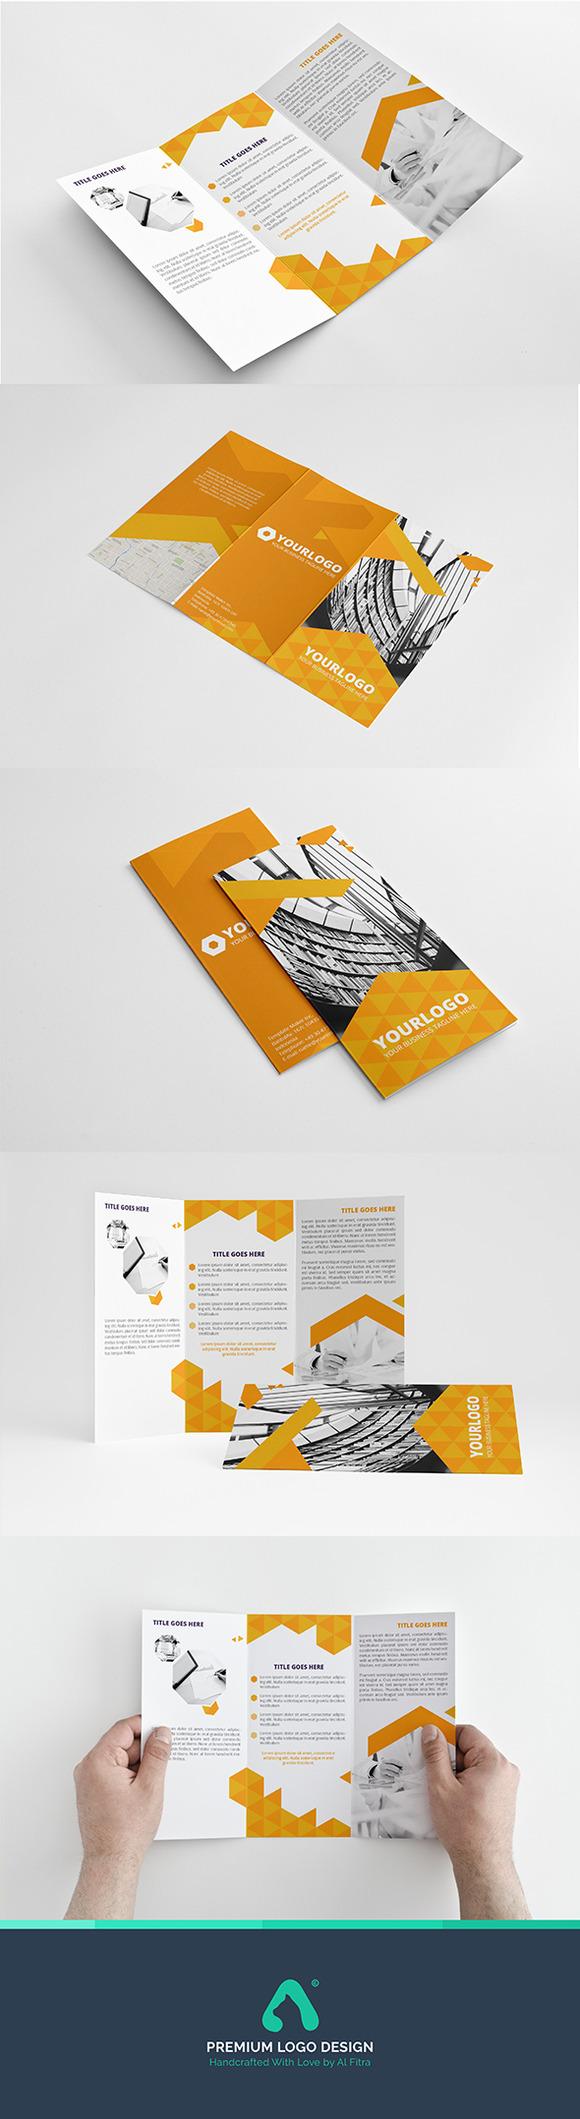 Orangel Trifold Template